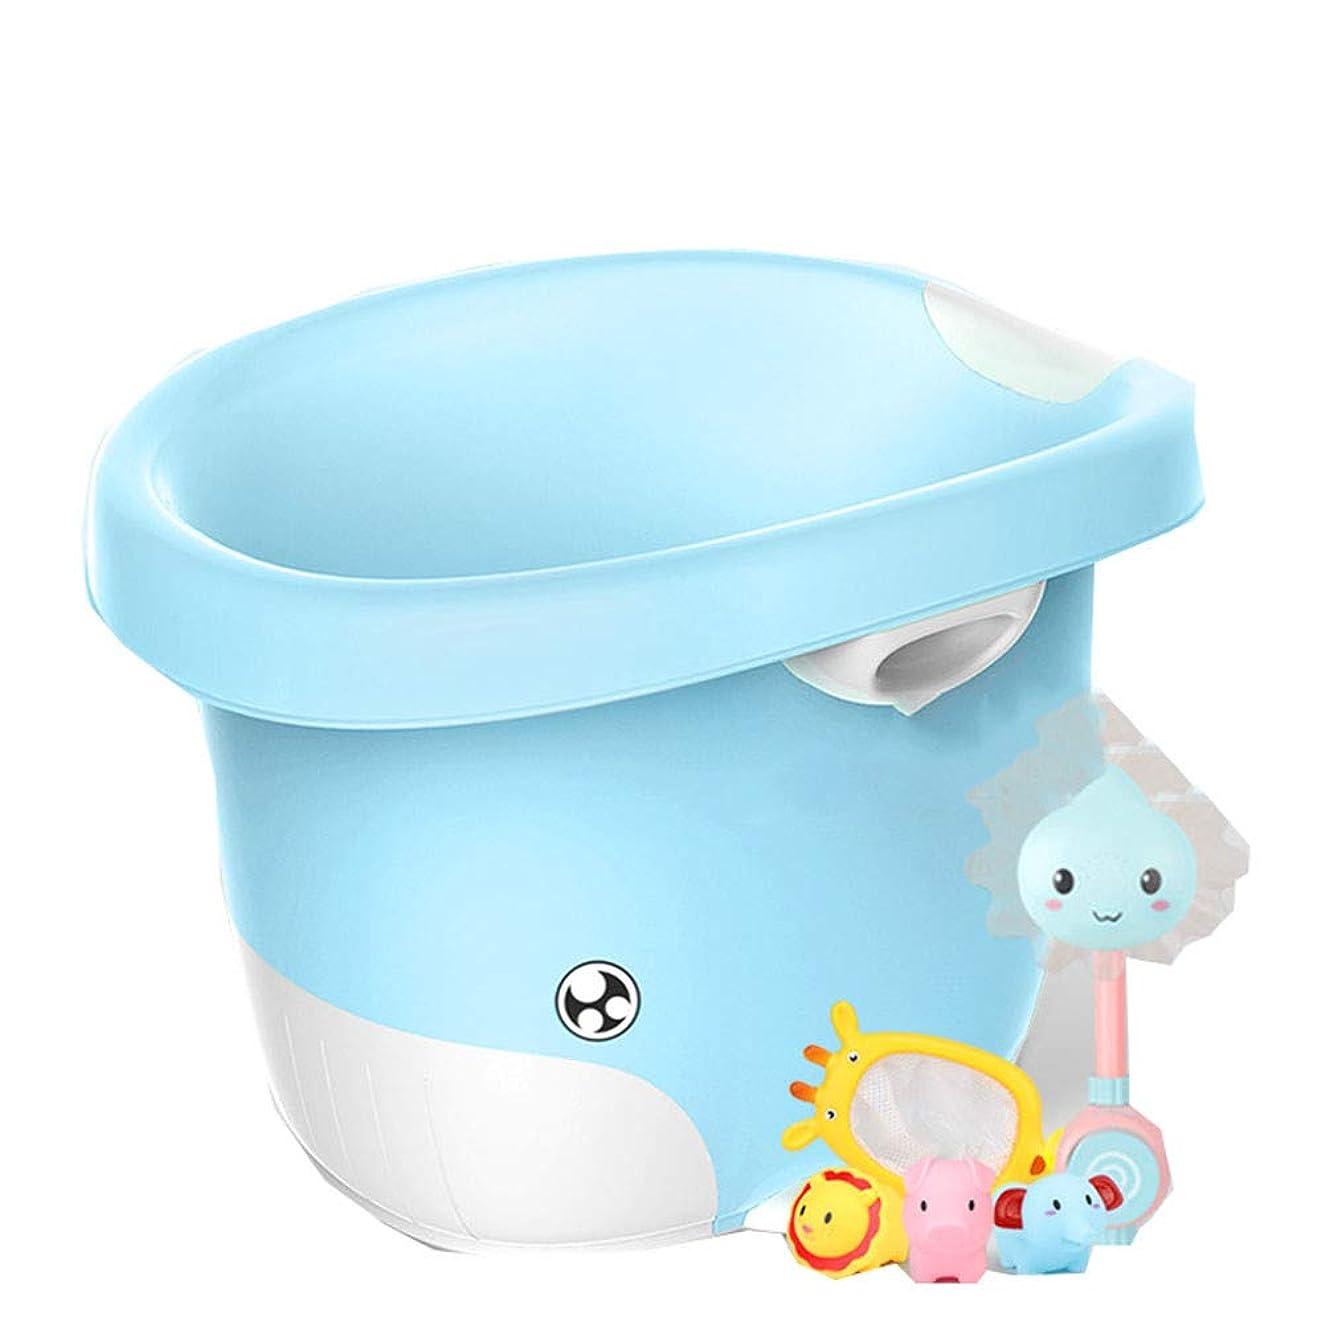 Yajun Baby Bath Tub Children's Barrel Infant Bucket Multifunction Shark Appearance Humanized Three-Dimensional Design Comfortable